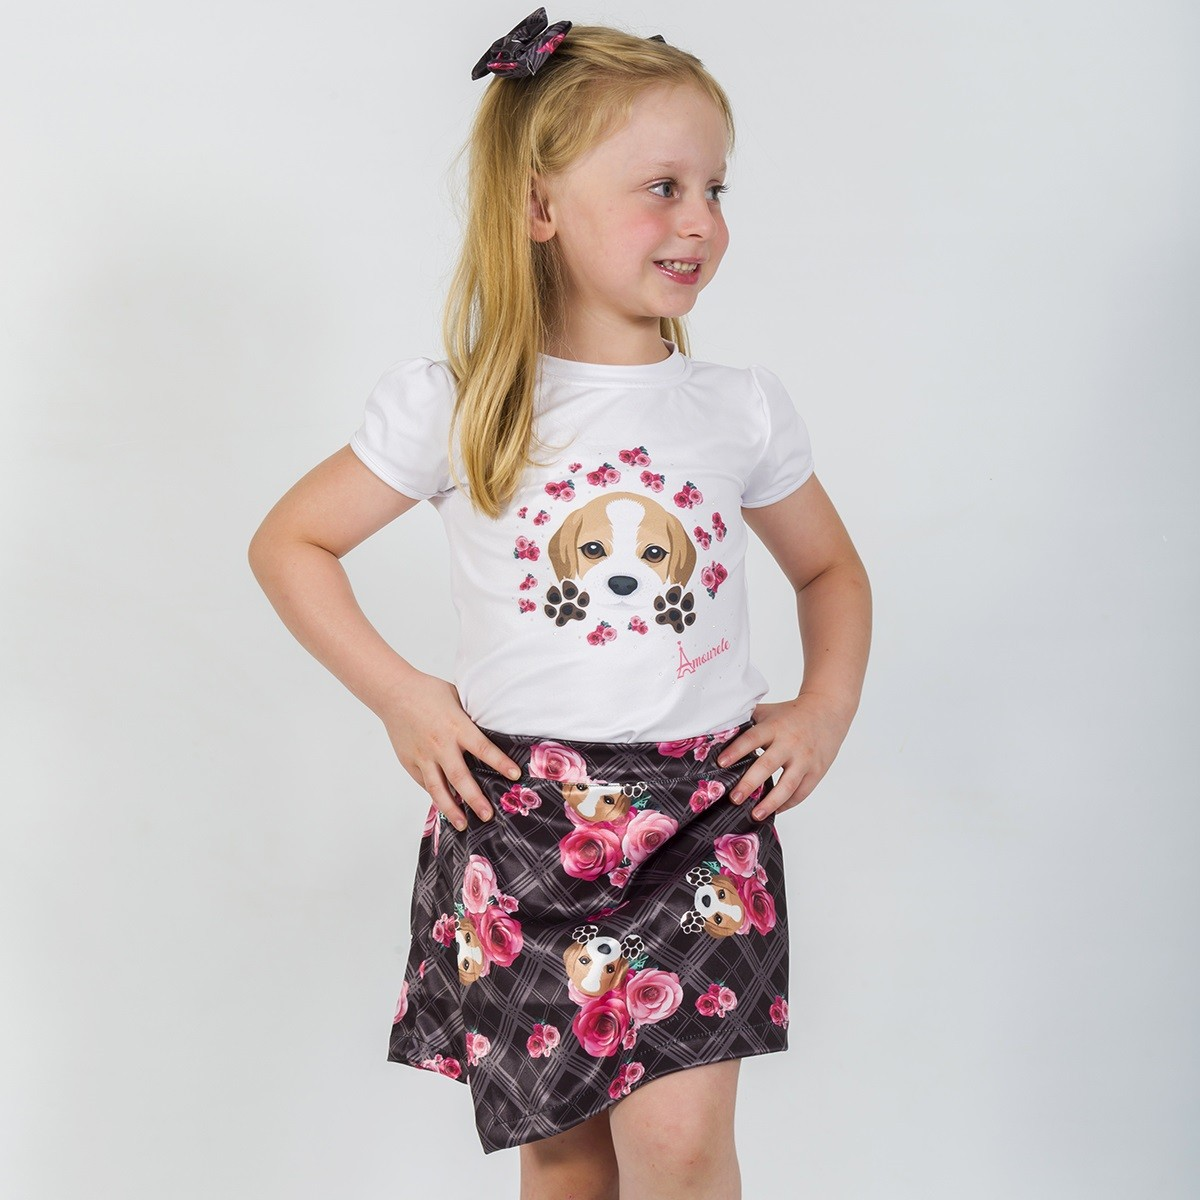 Conjunto Blusa e Shorts Saia Infantil Beagle Xadrez Preto